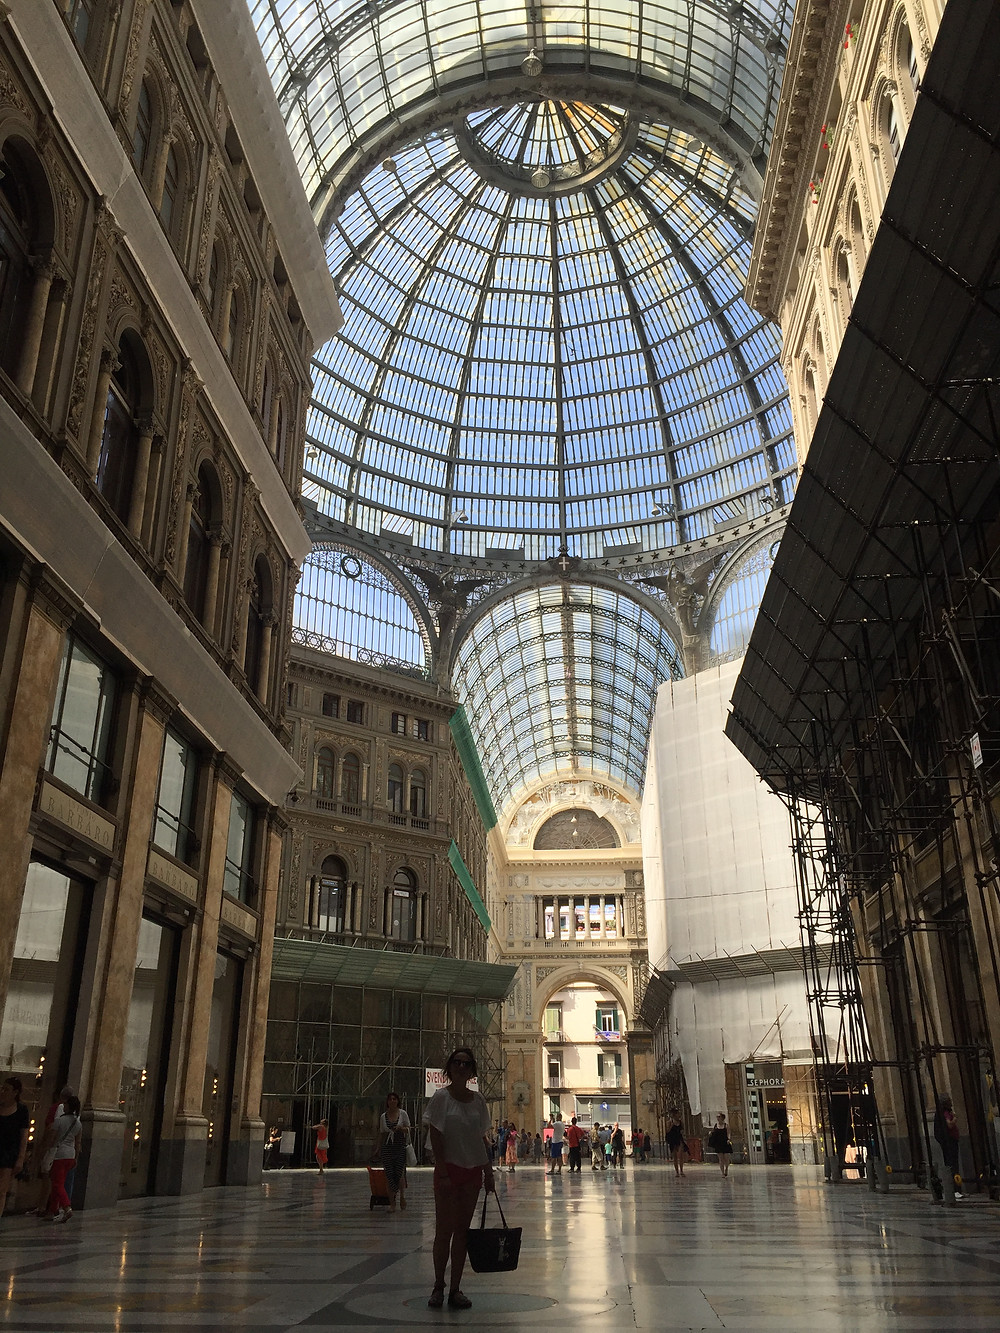 Napoli Galleria Umberto 1